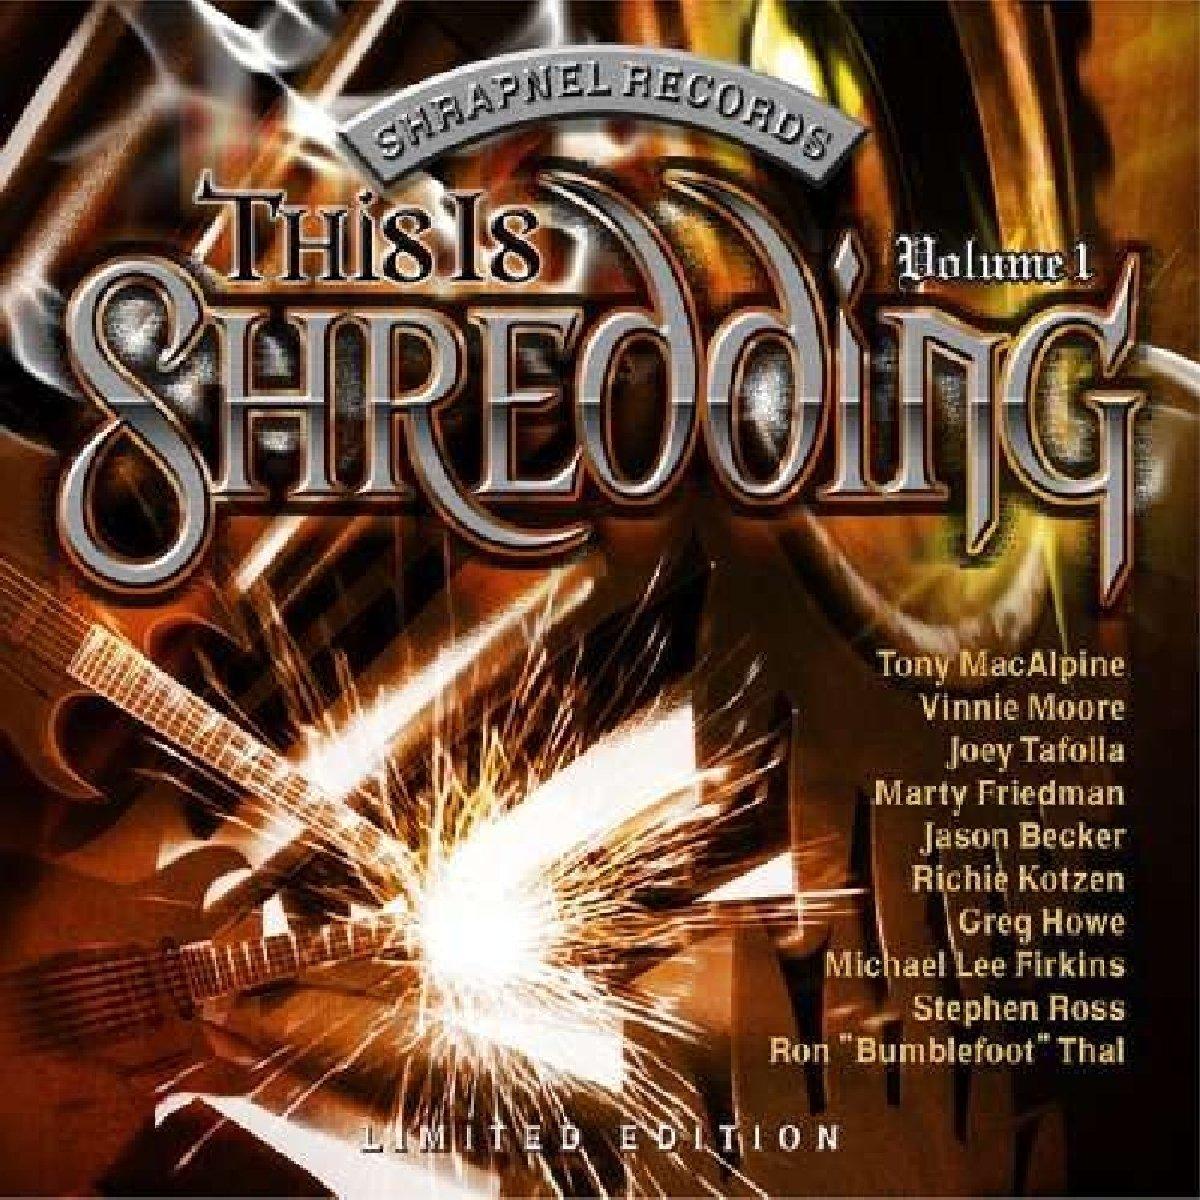 This Is Shredding Vo: Various Artists: Amazon.es: Música